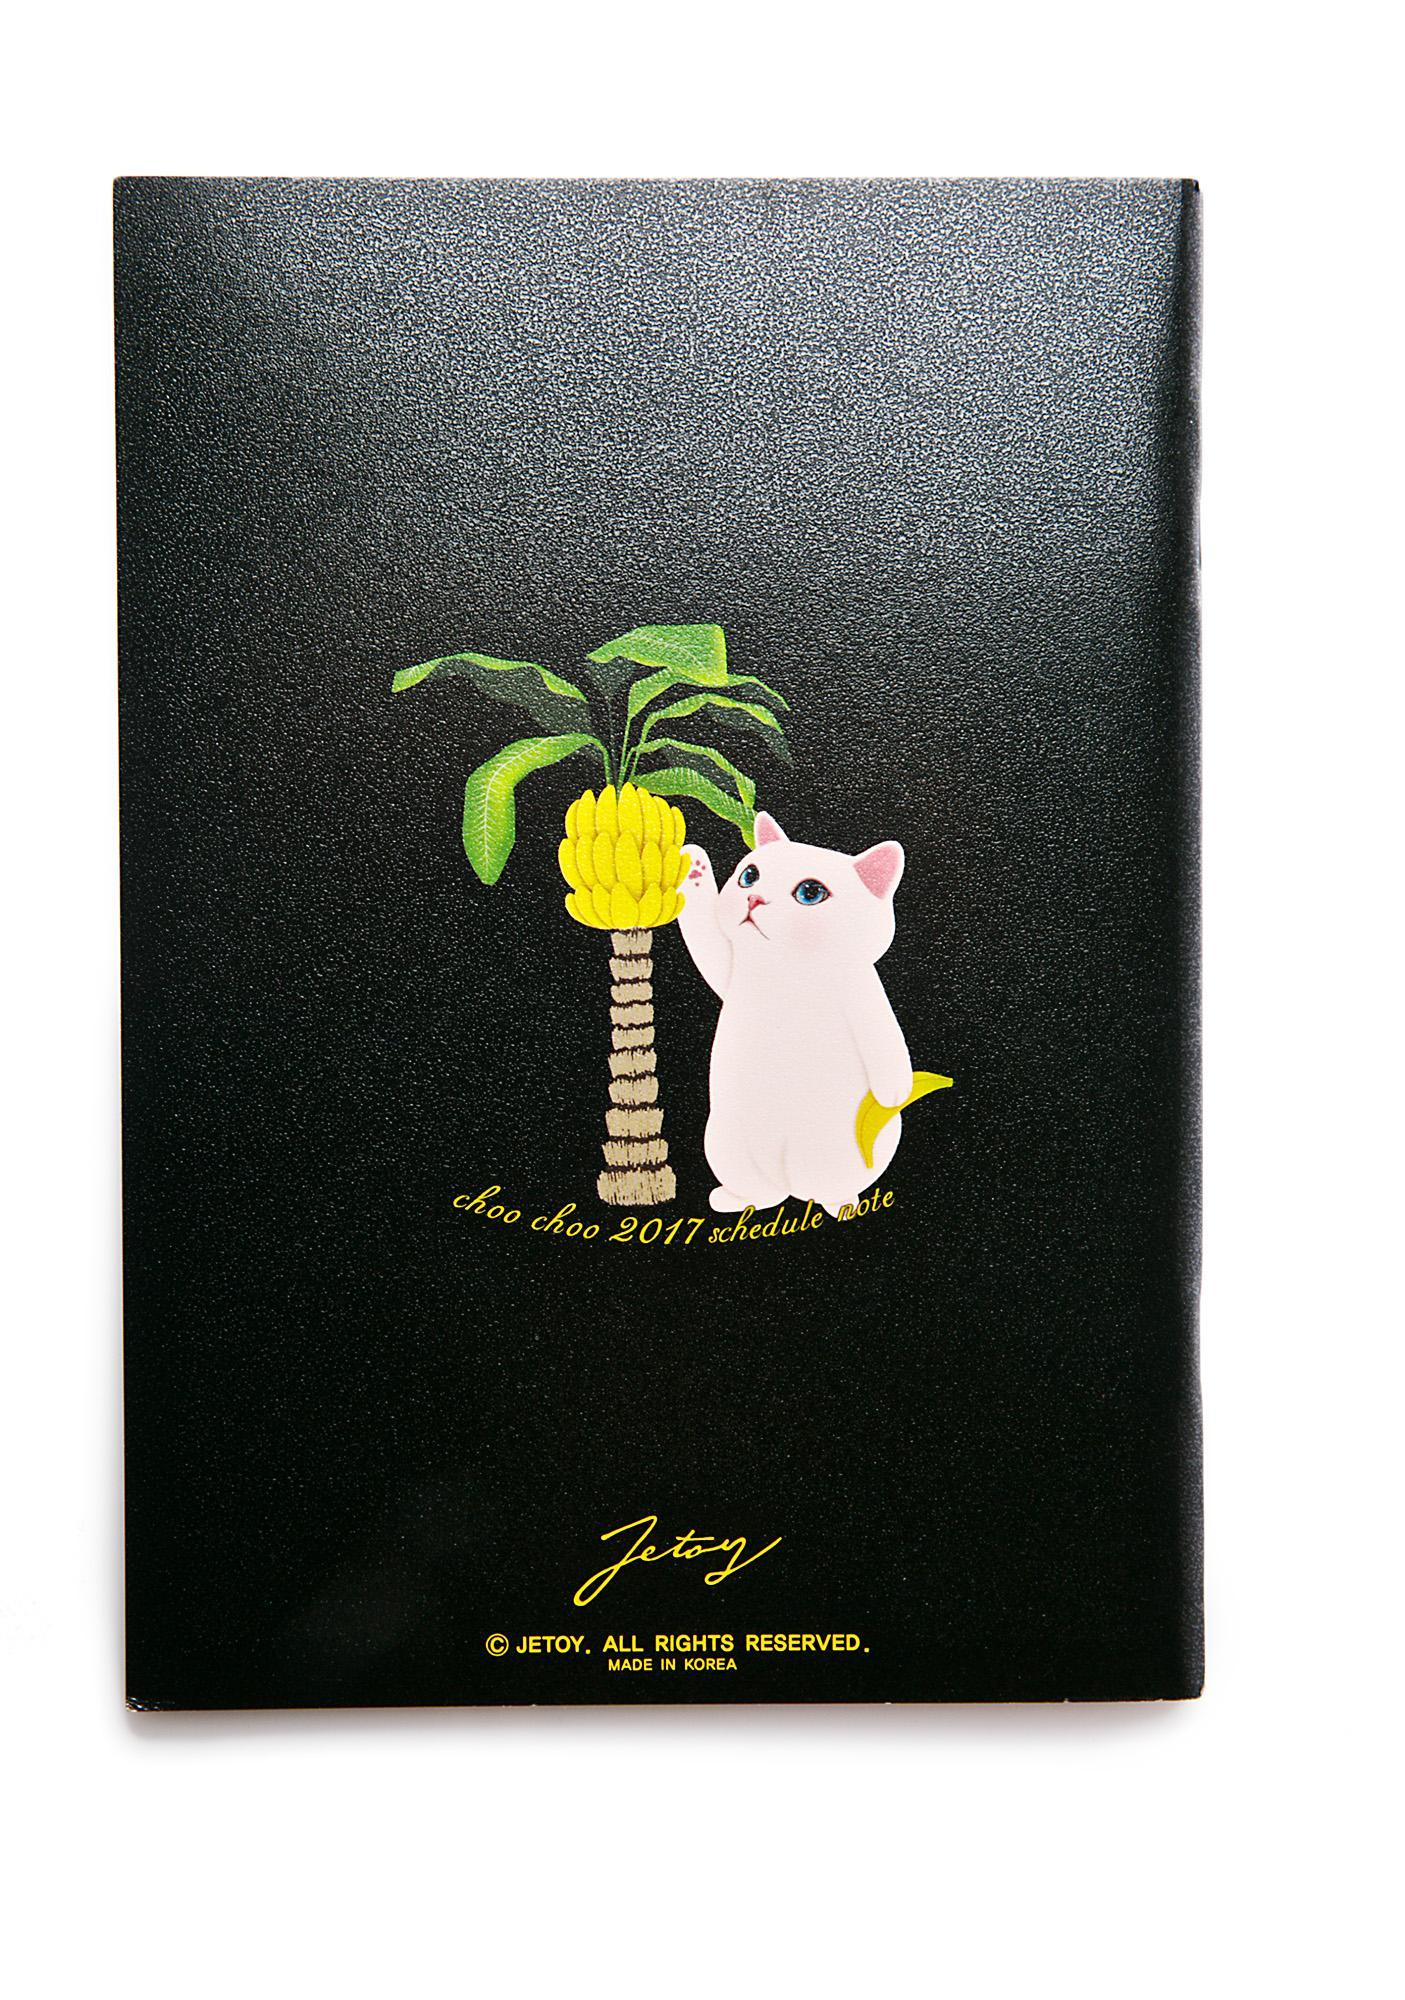 Jetoy 2017 Scheduler Banana Cat